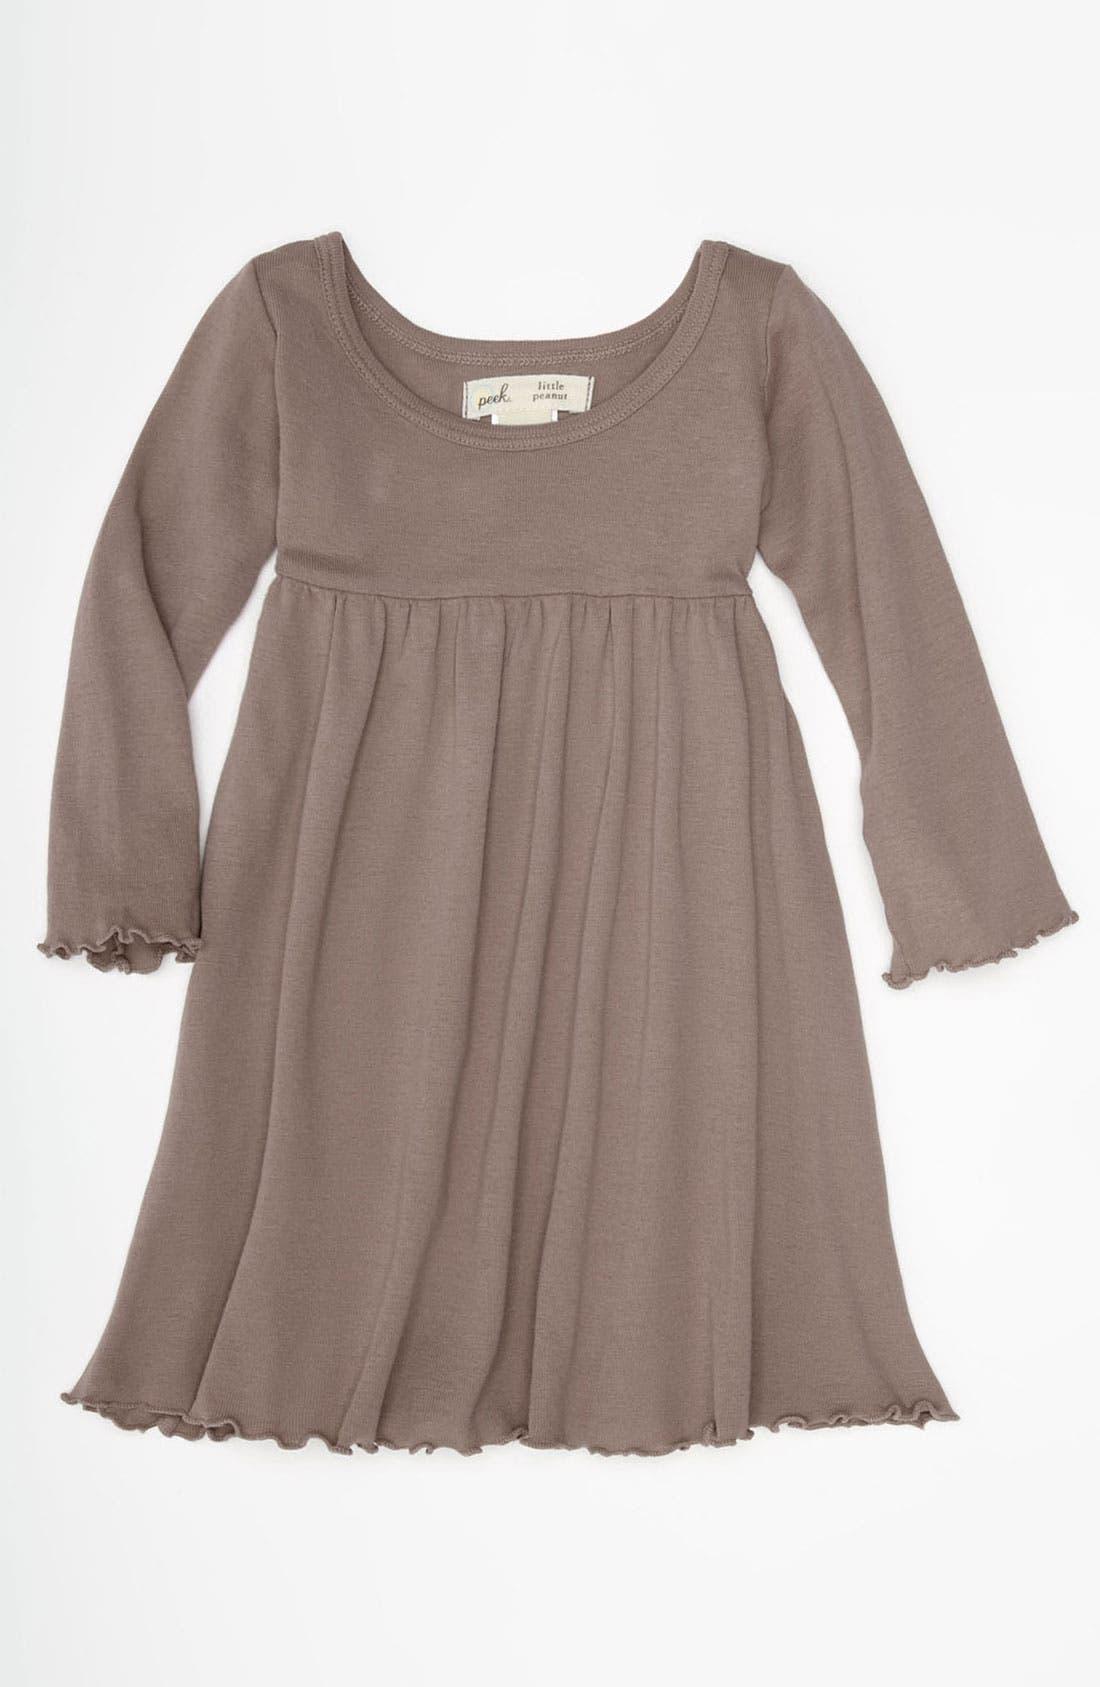 Alternate Image 1 Selected - Peek 'Little Peanut' Long Sleeve Dress (Baby)